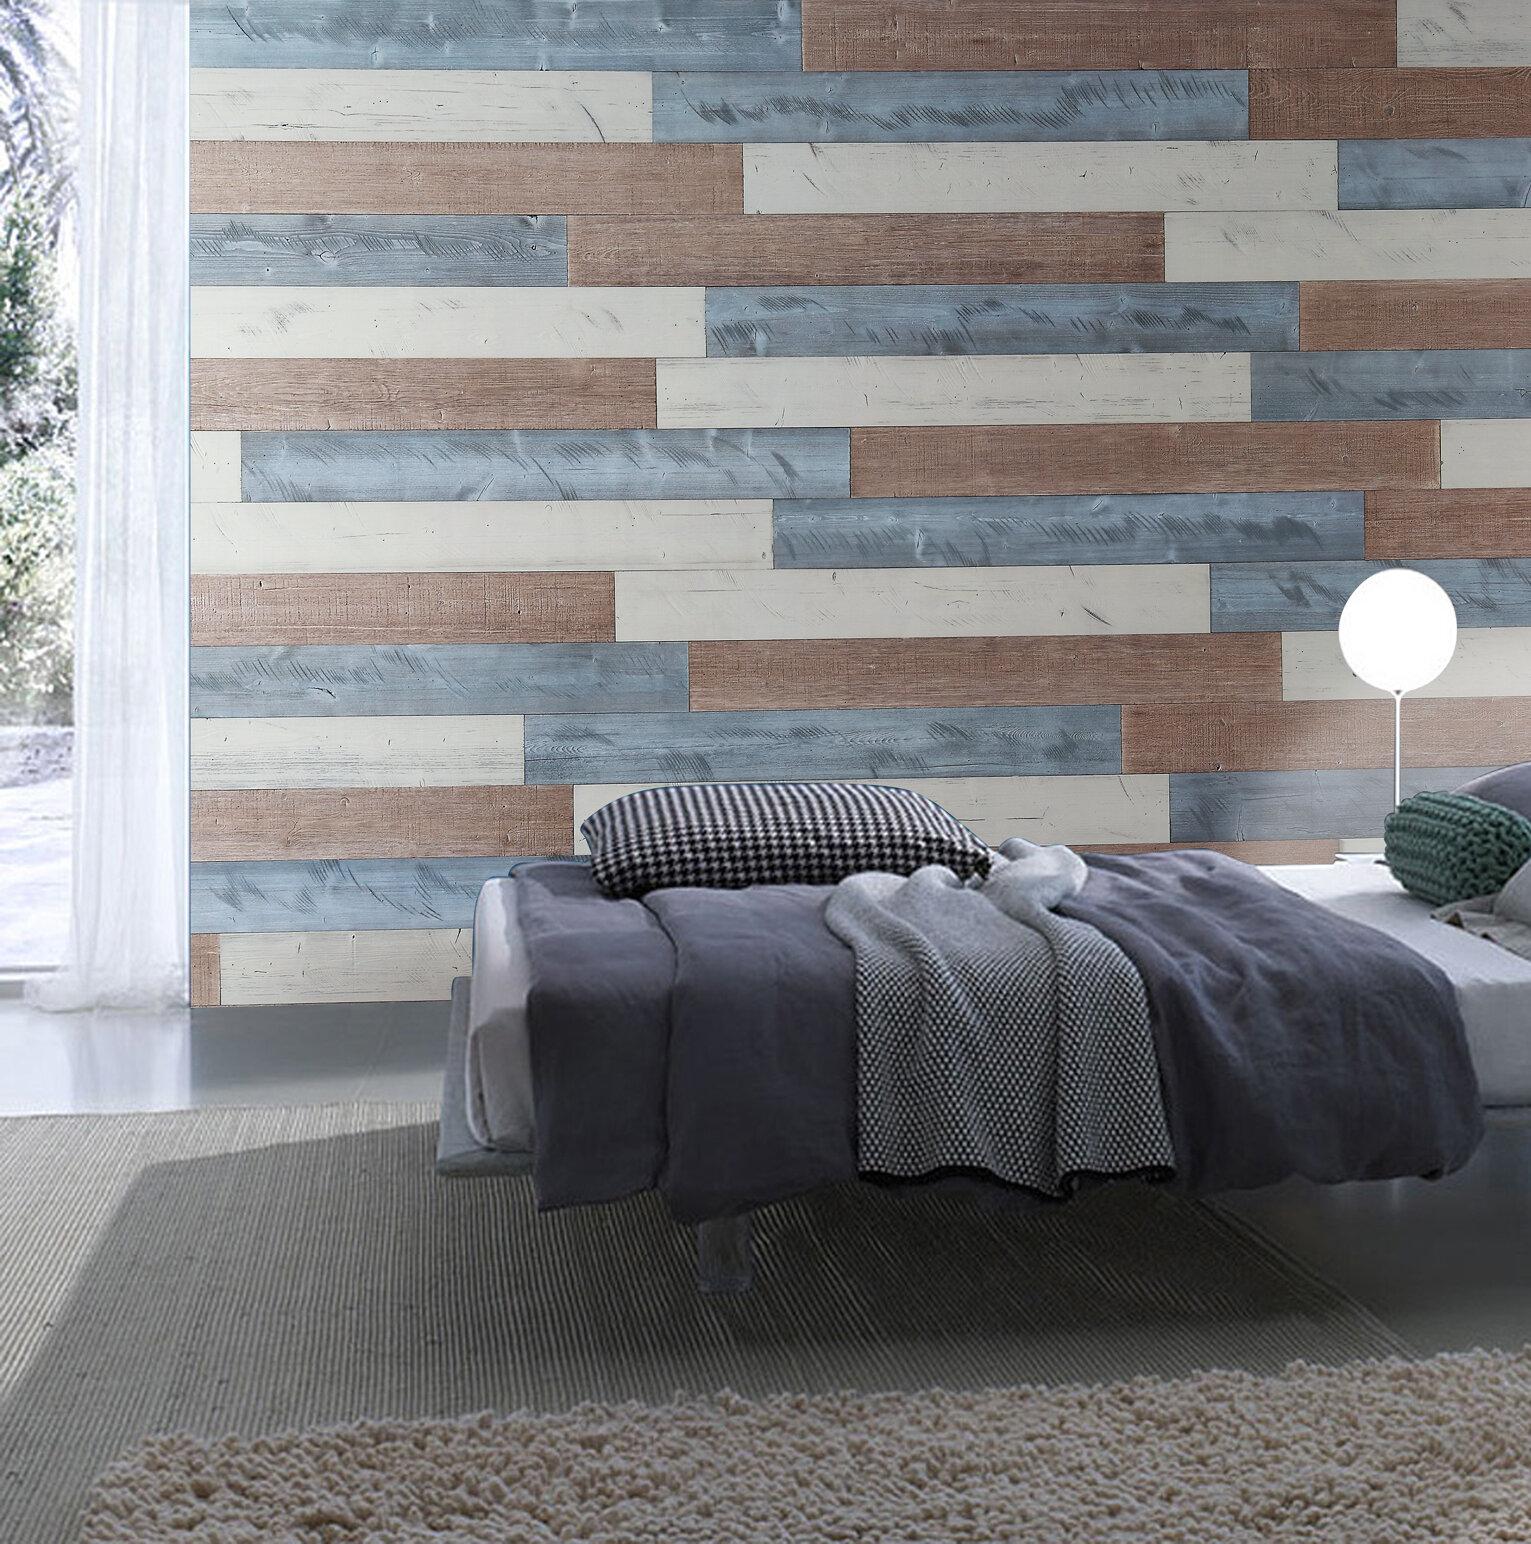 Woodywalls Peel And Stick Wood Wall Panels Diy (195 Sq